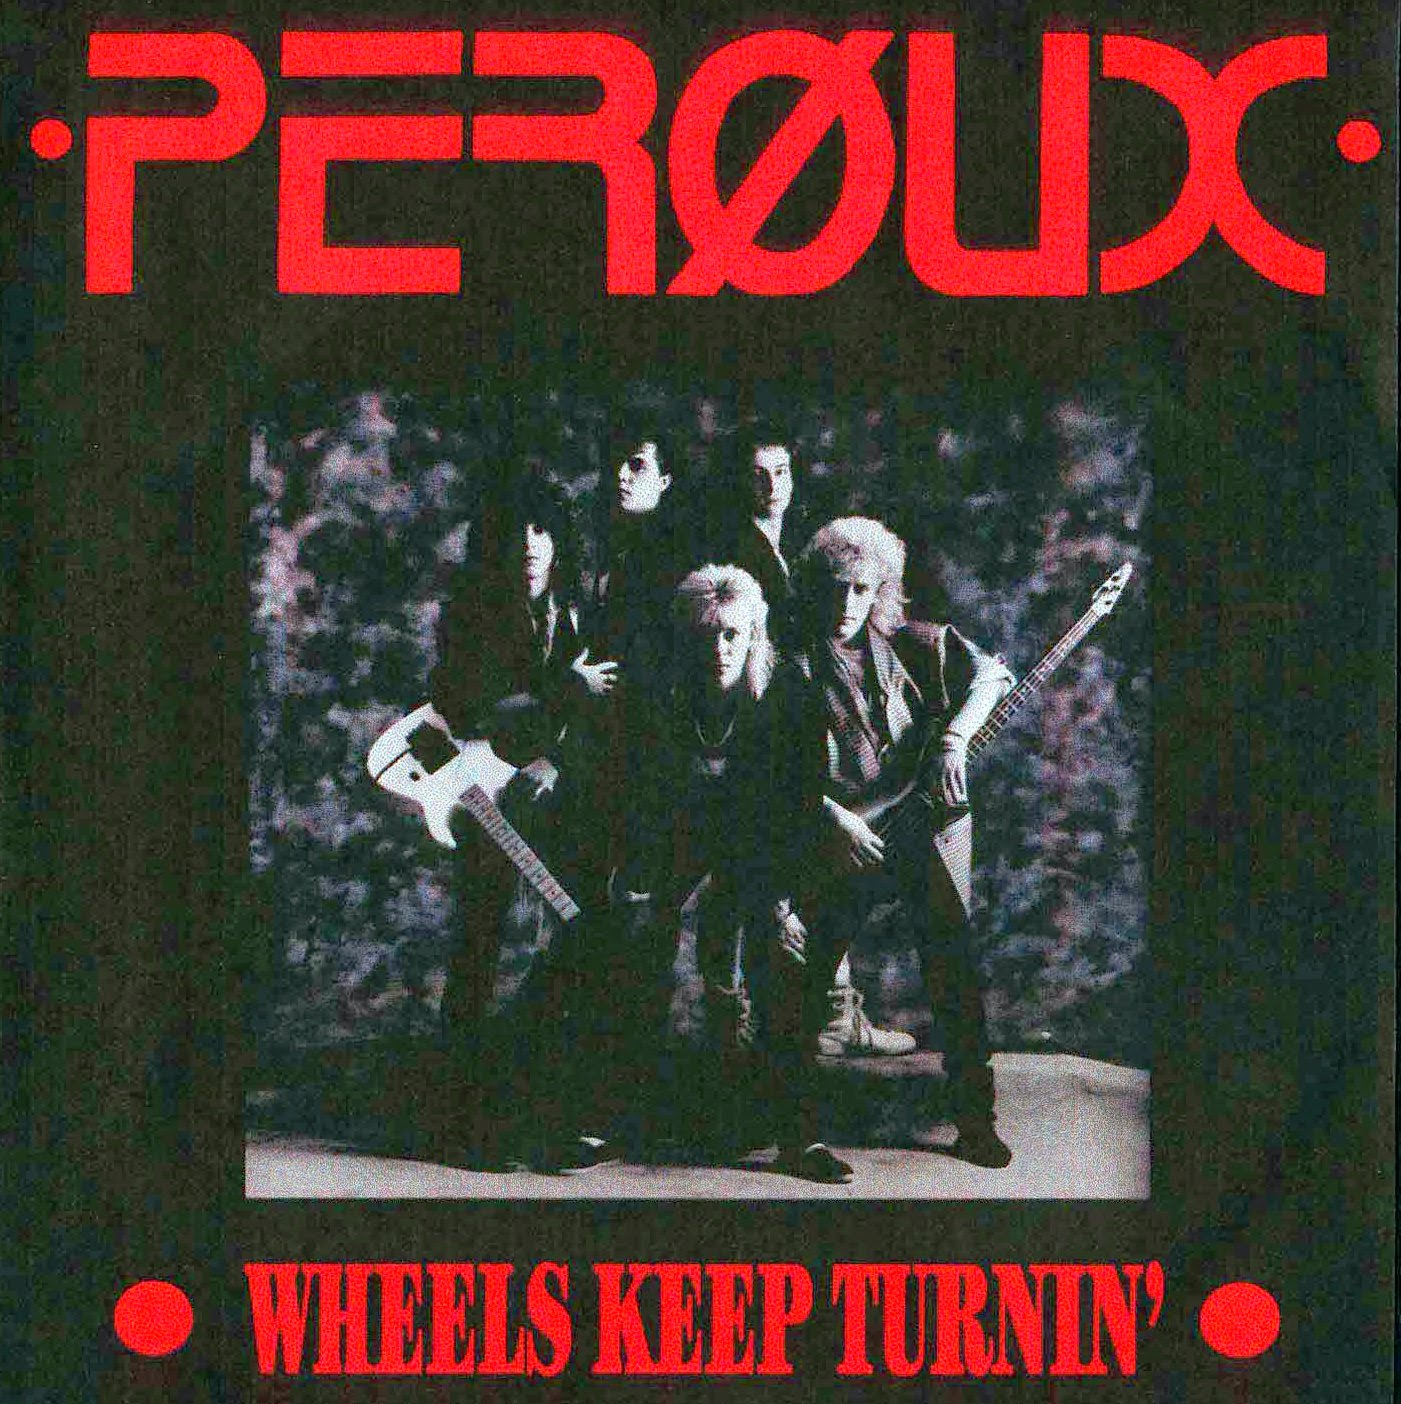 Peroux Wheels keep turning 1988 aor melodic rock